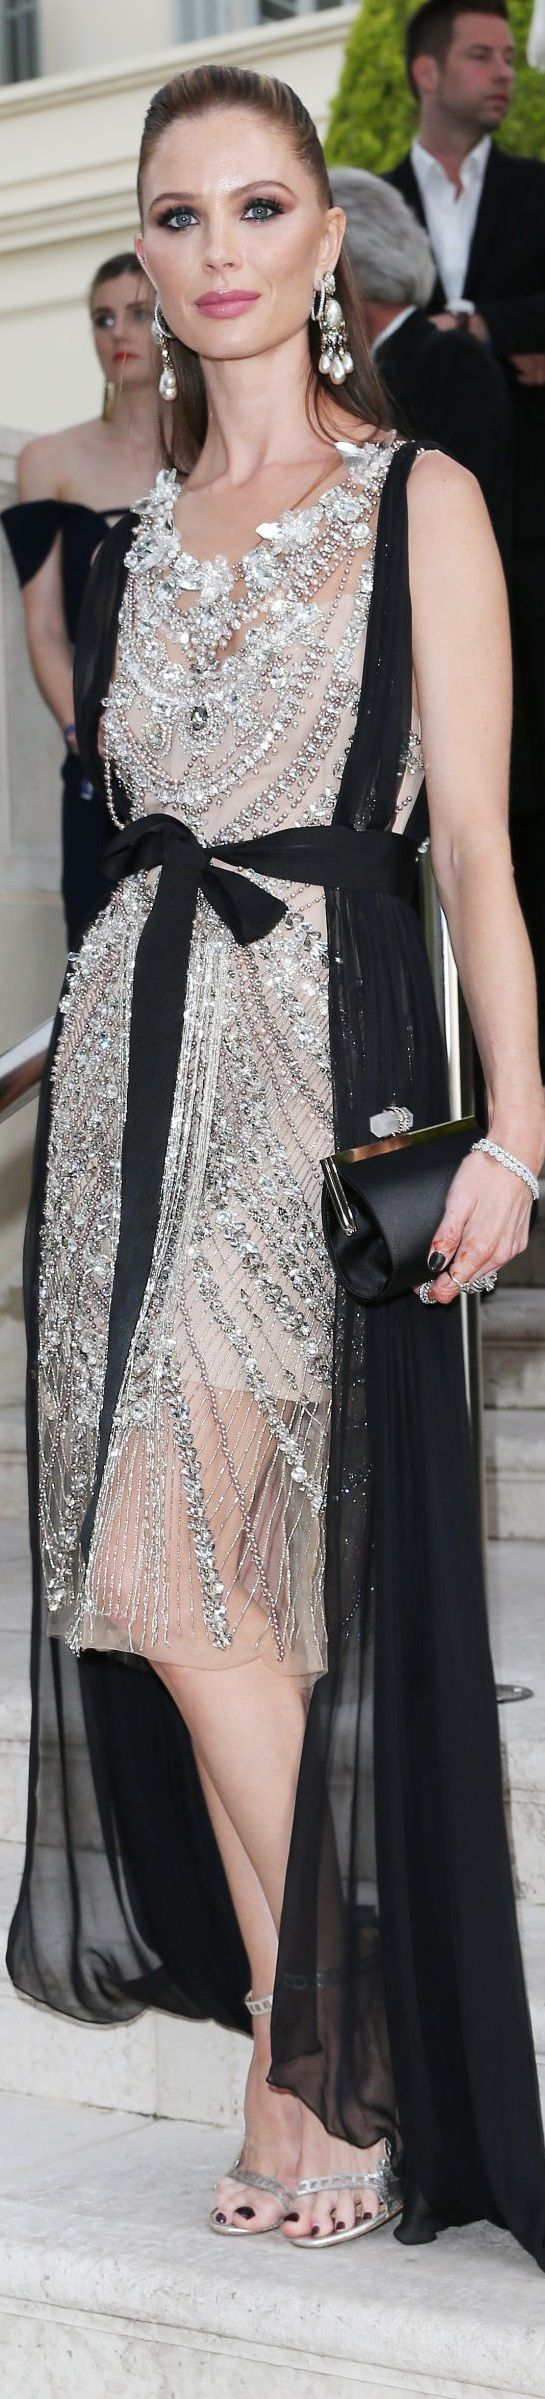 Georgina Chapman in Marchesa Cannes Film Festival 2017